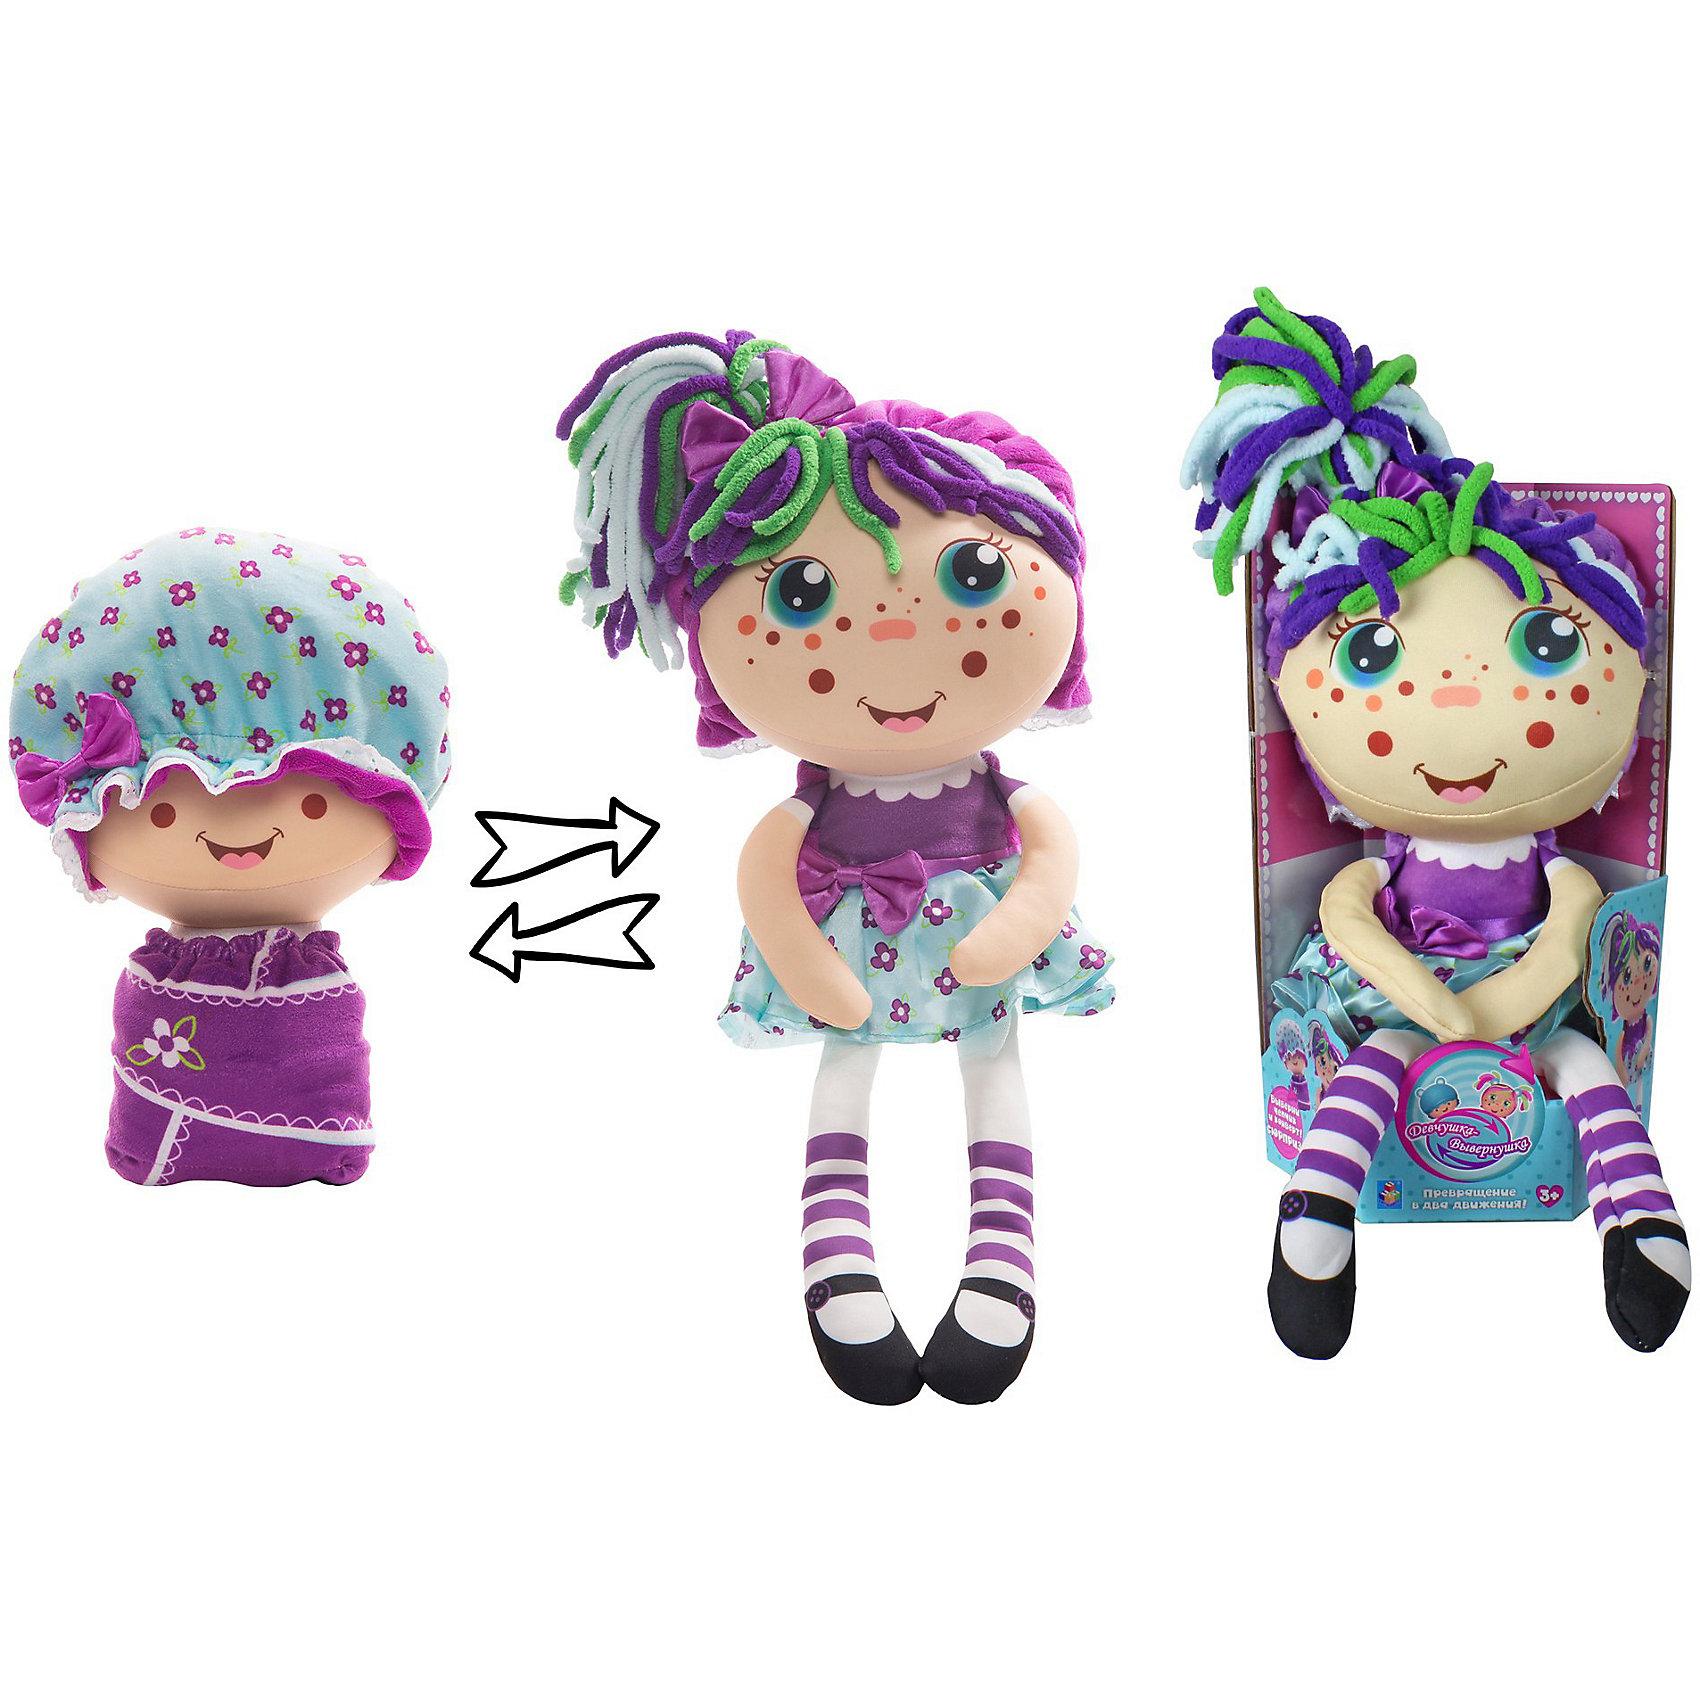 Фото 2 - Мягкая кукла 2 в 1 1toy